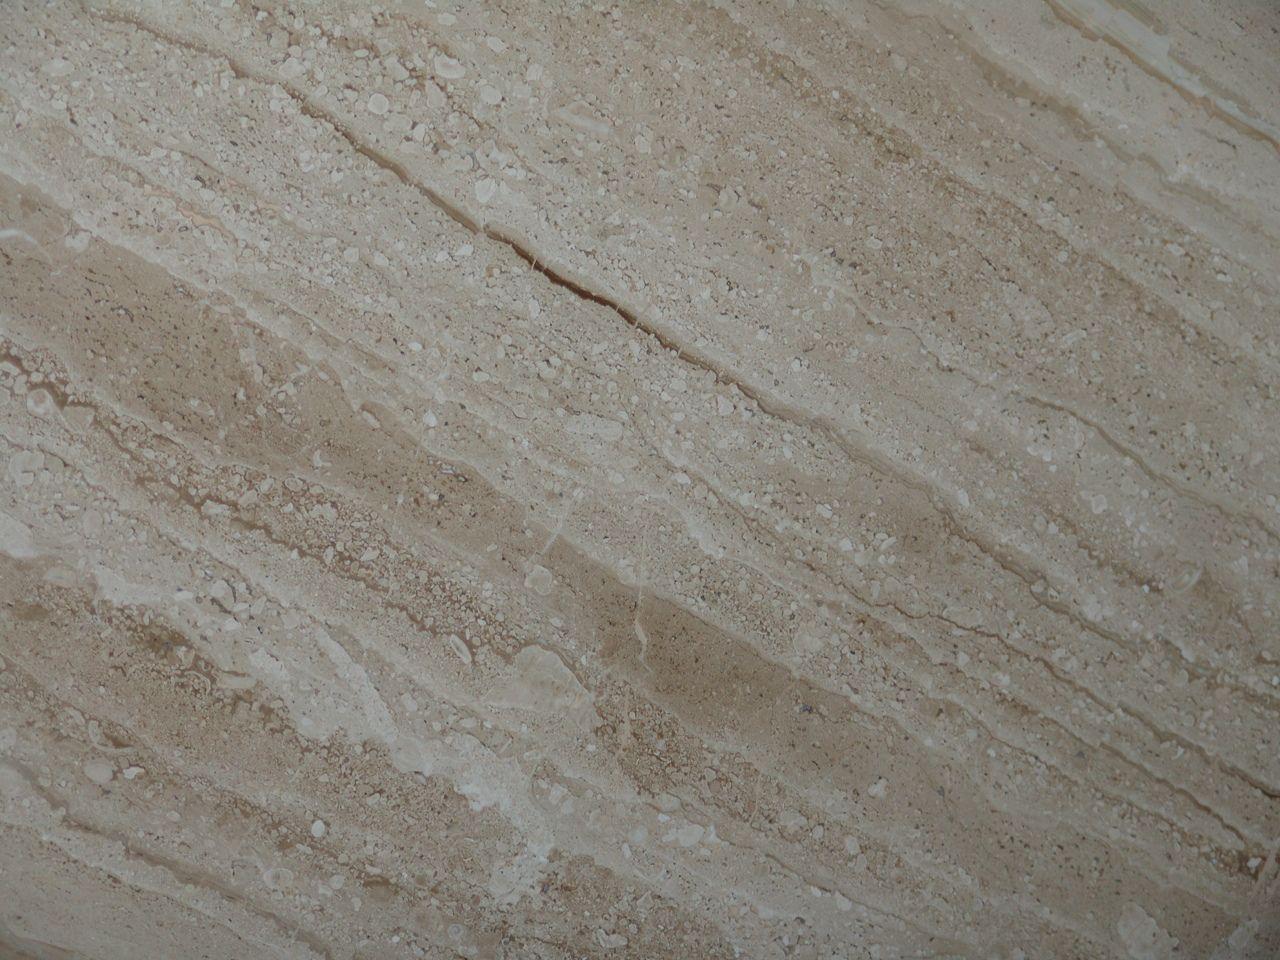 Breccia Oniciata Marble Wall Cladding Marble Flooring